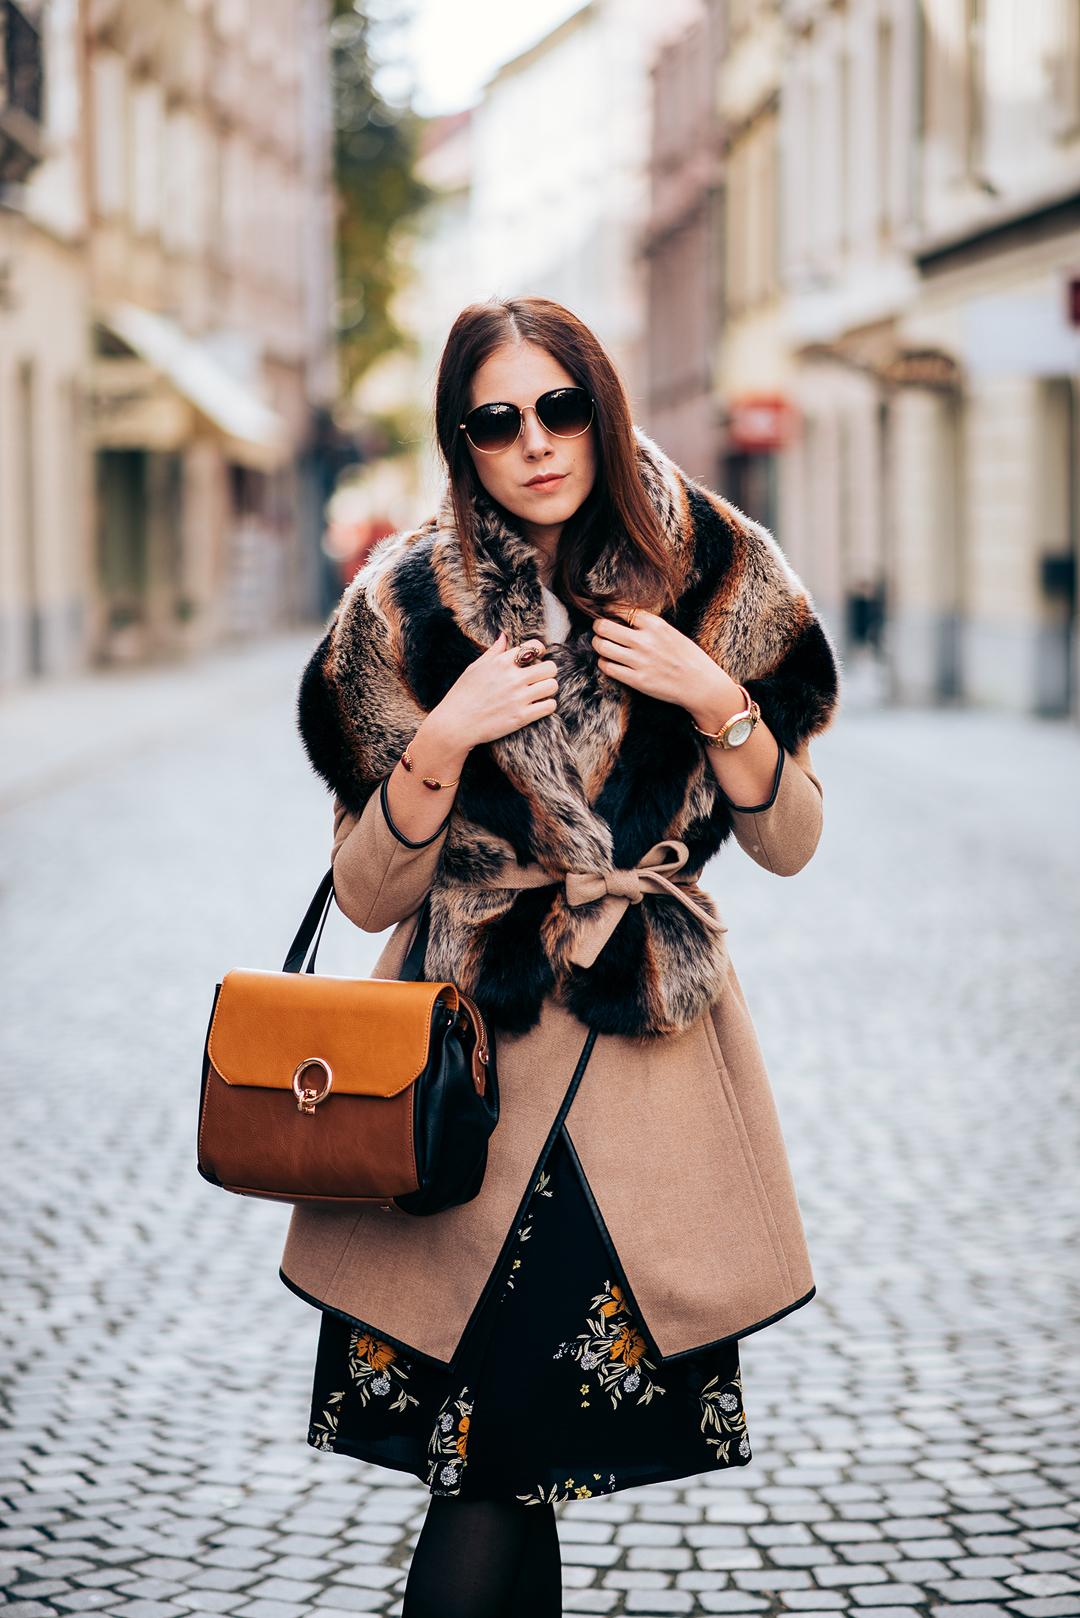 eva-ahacevcic_love-eva_sportina_parfois_ootd_accessories